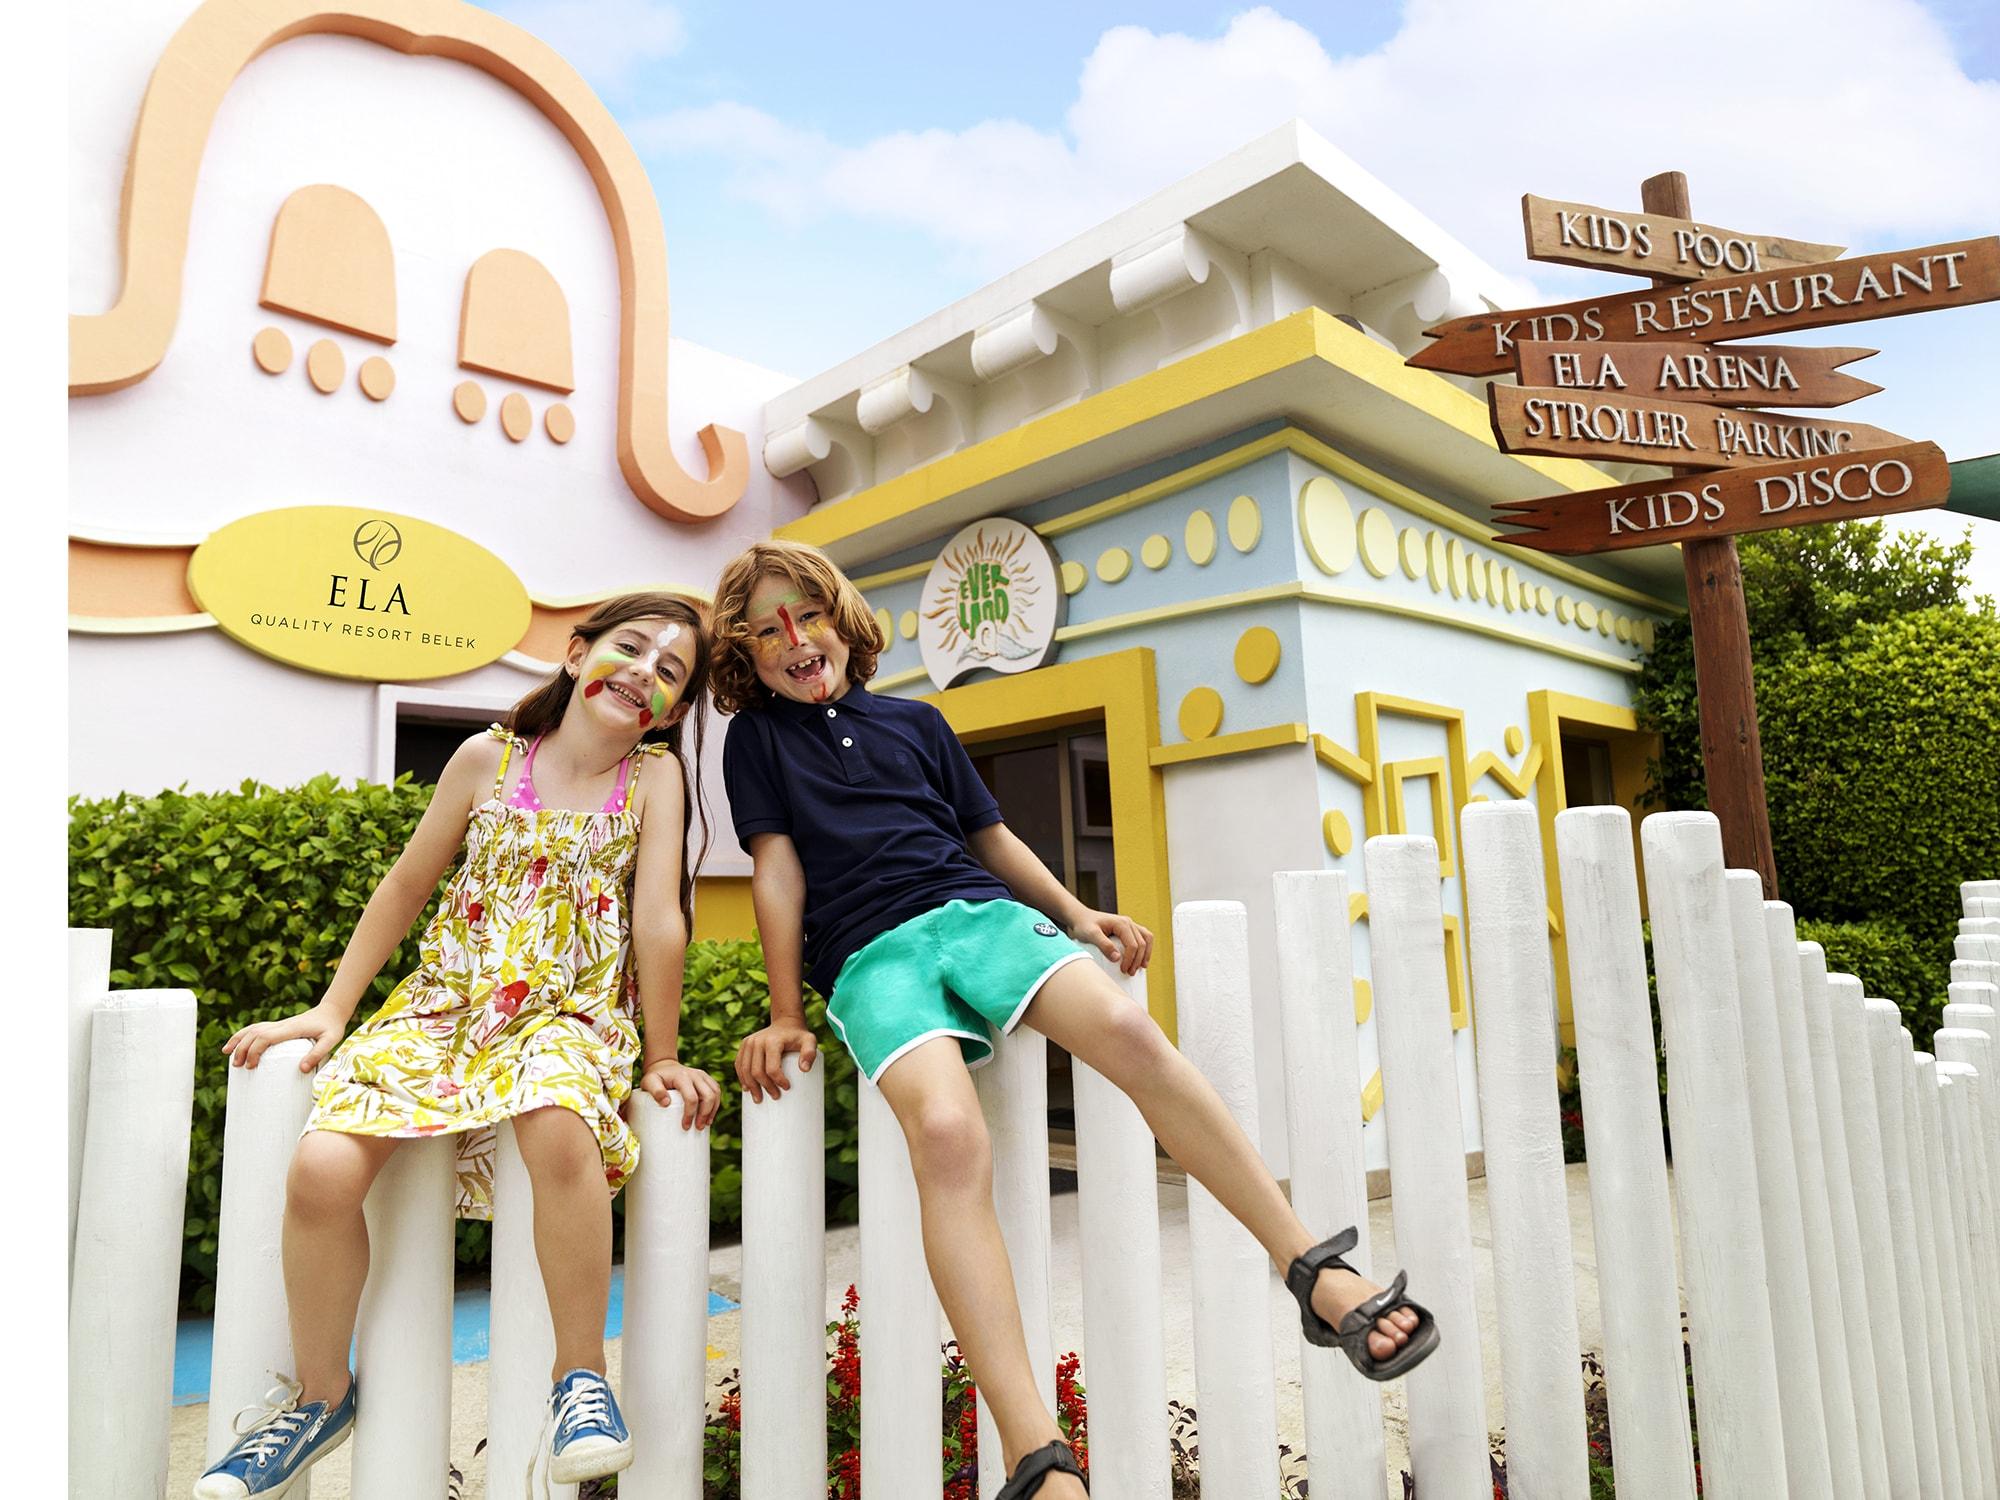 Perfekter Last Minute Urlaub im ELA Quality Resort Belek